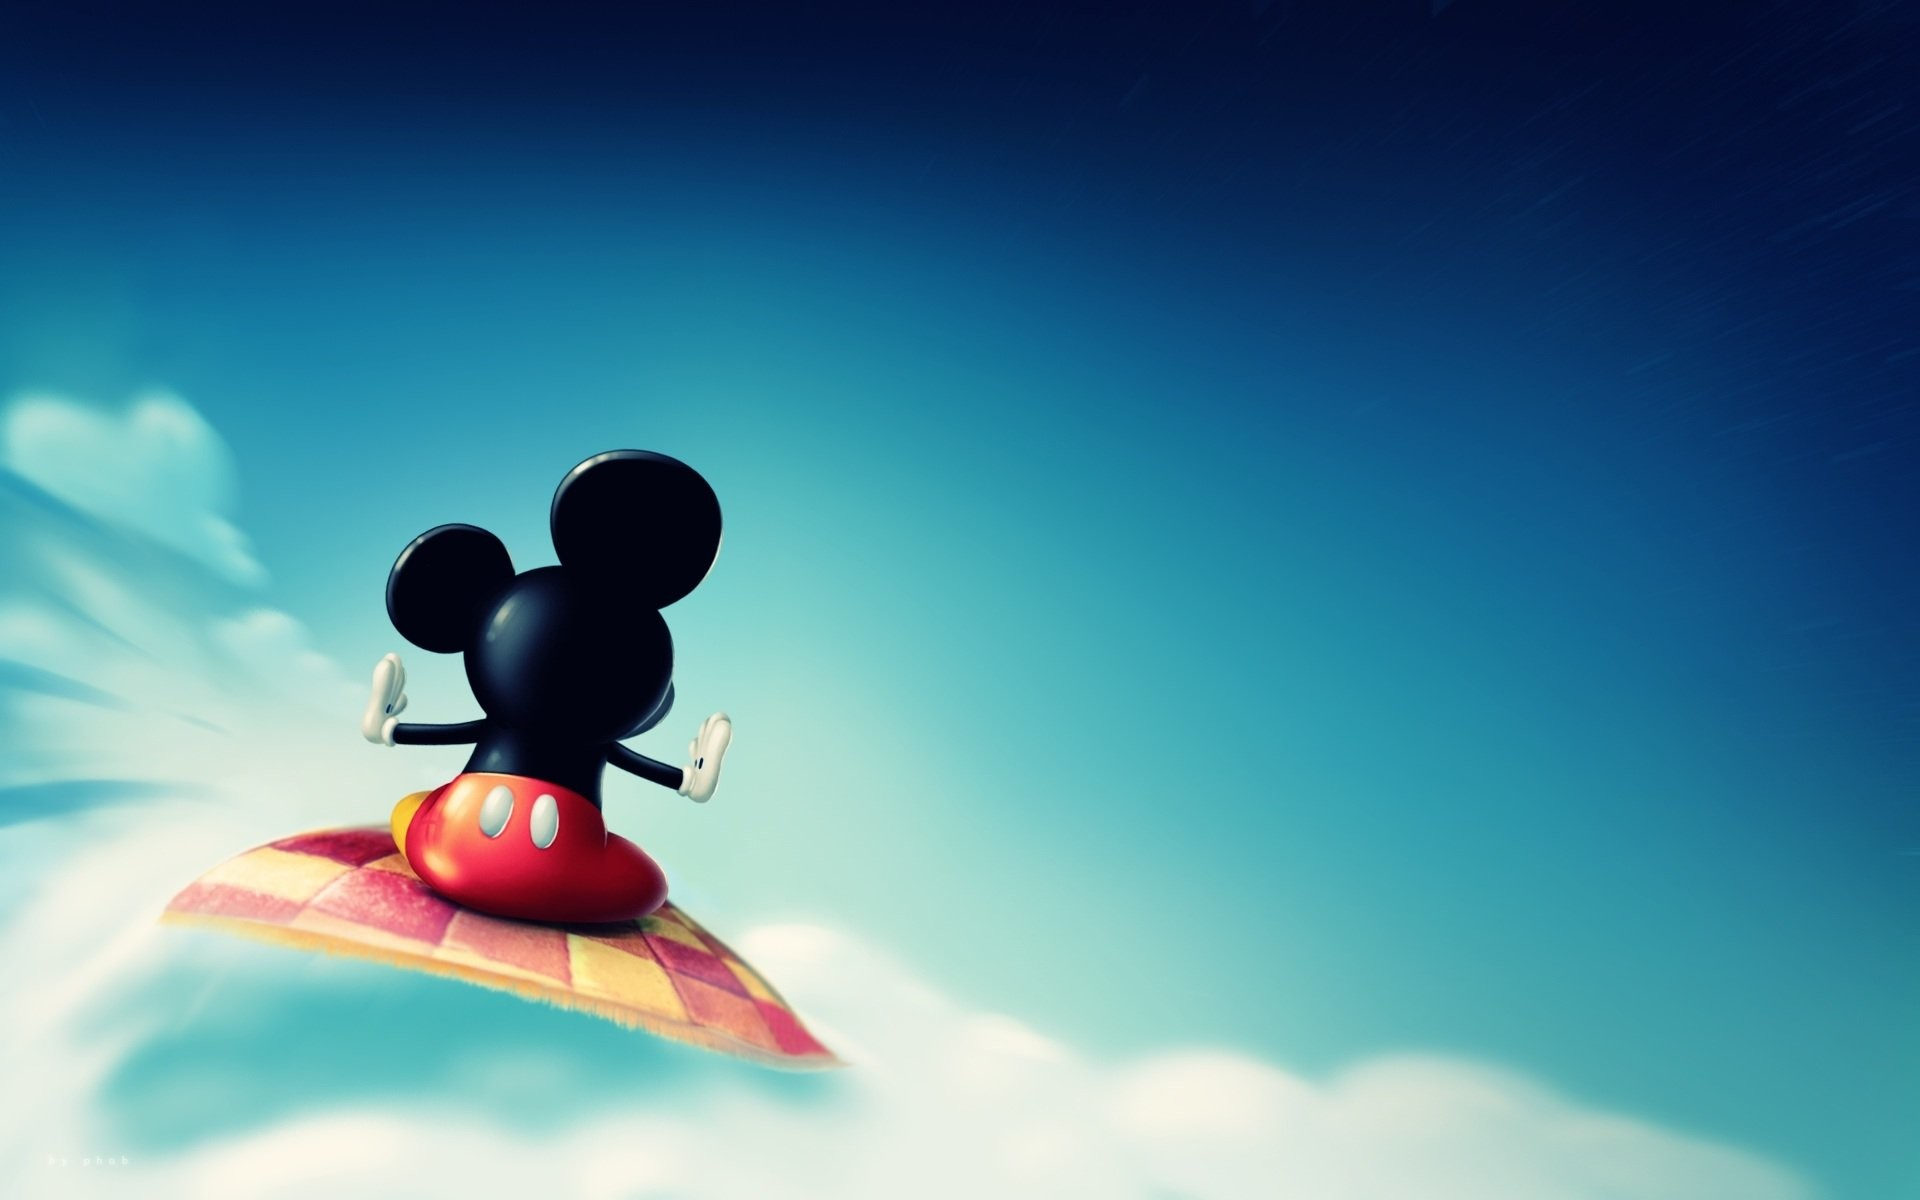 High Resolution Disney Wallpaper: Disney HD Wallpaper (74+ Images